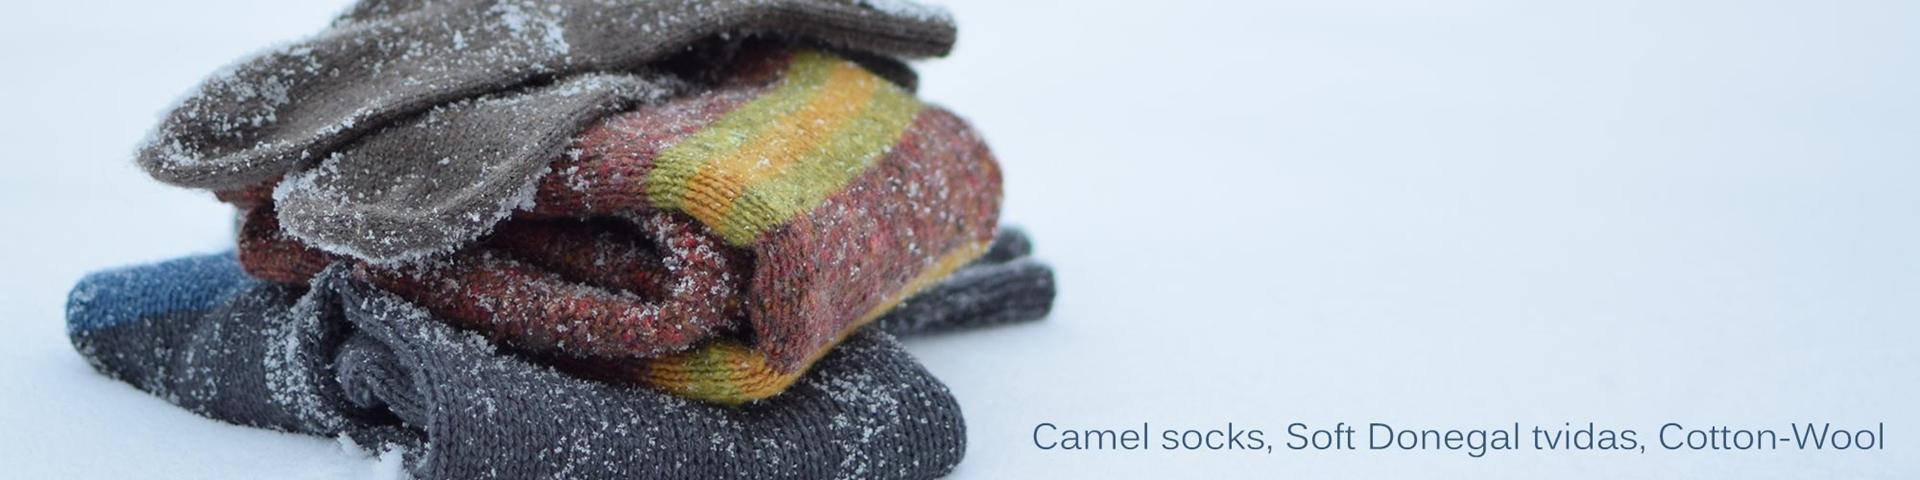 KATIA Camel Socks, Soft Donegal tvidas, Cotton-Wool